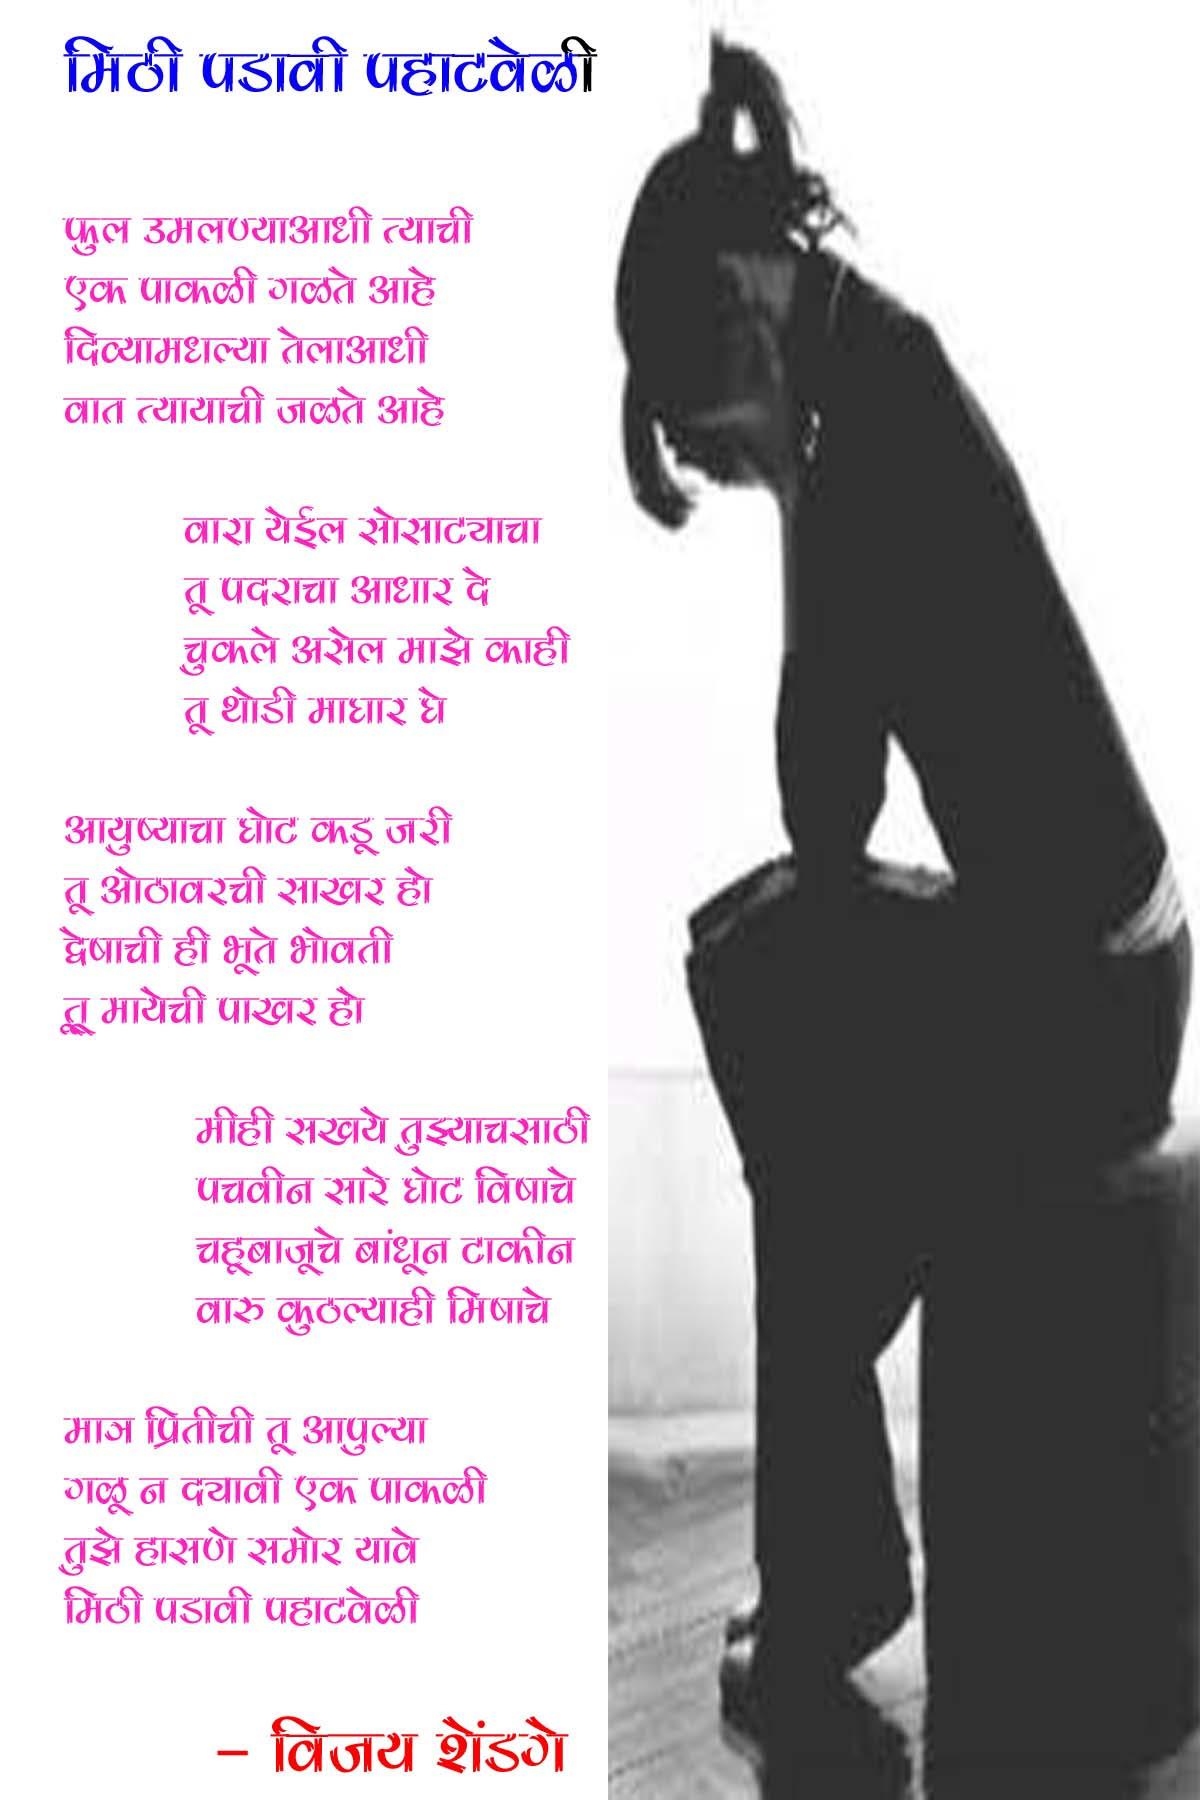 http://reghana.files.wordpress.com/2010/10/mithi-pdawi-phatweli.jpg